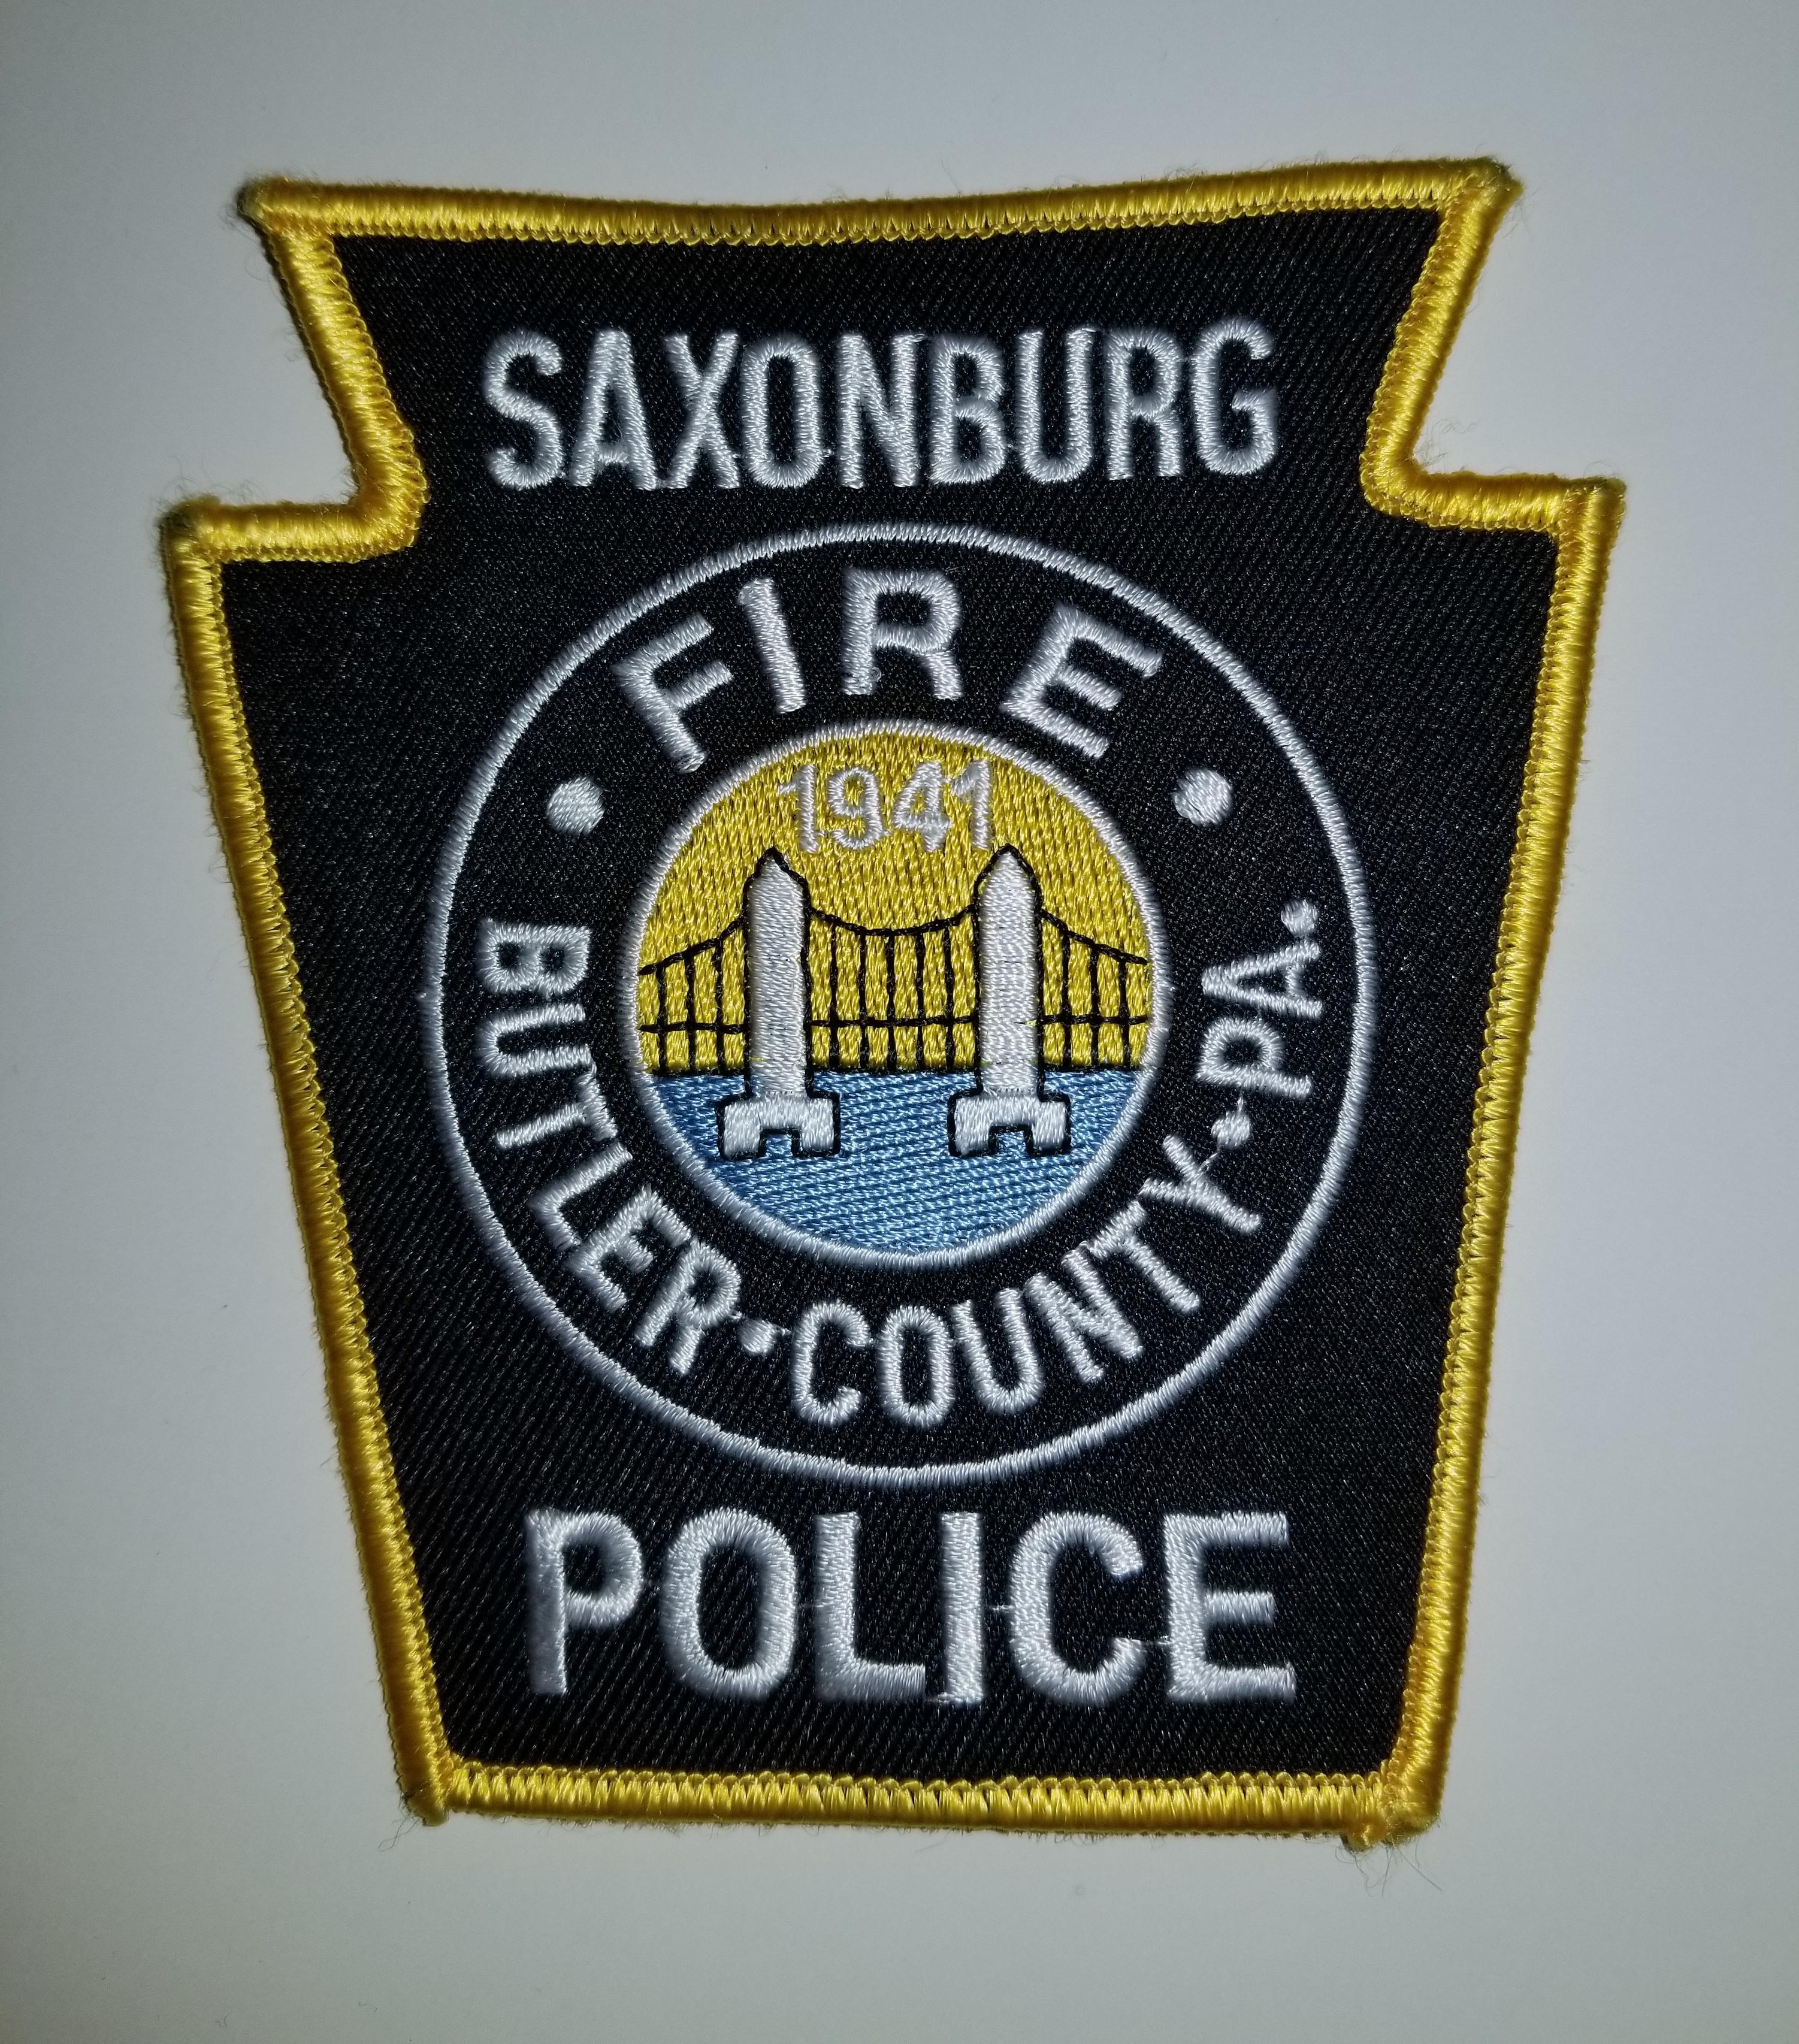 Saxonburg Fire Police